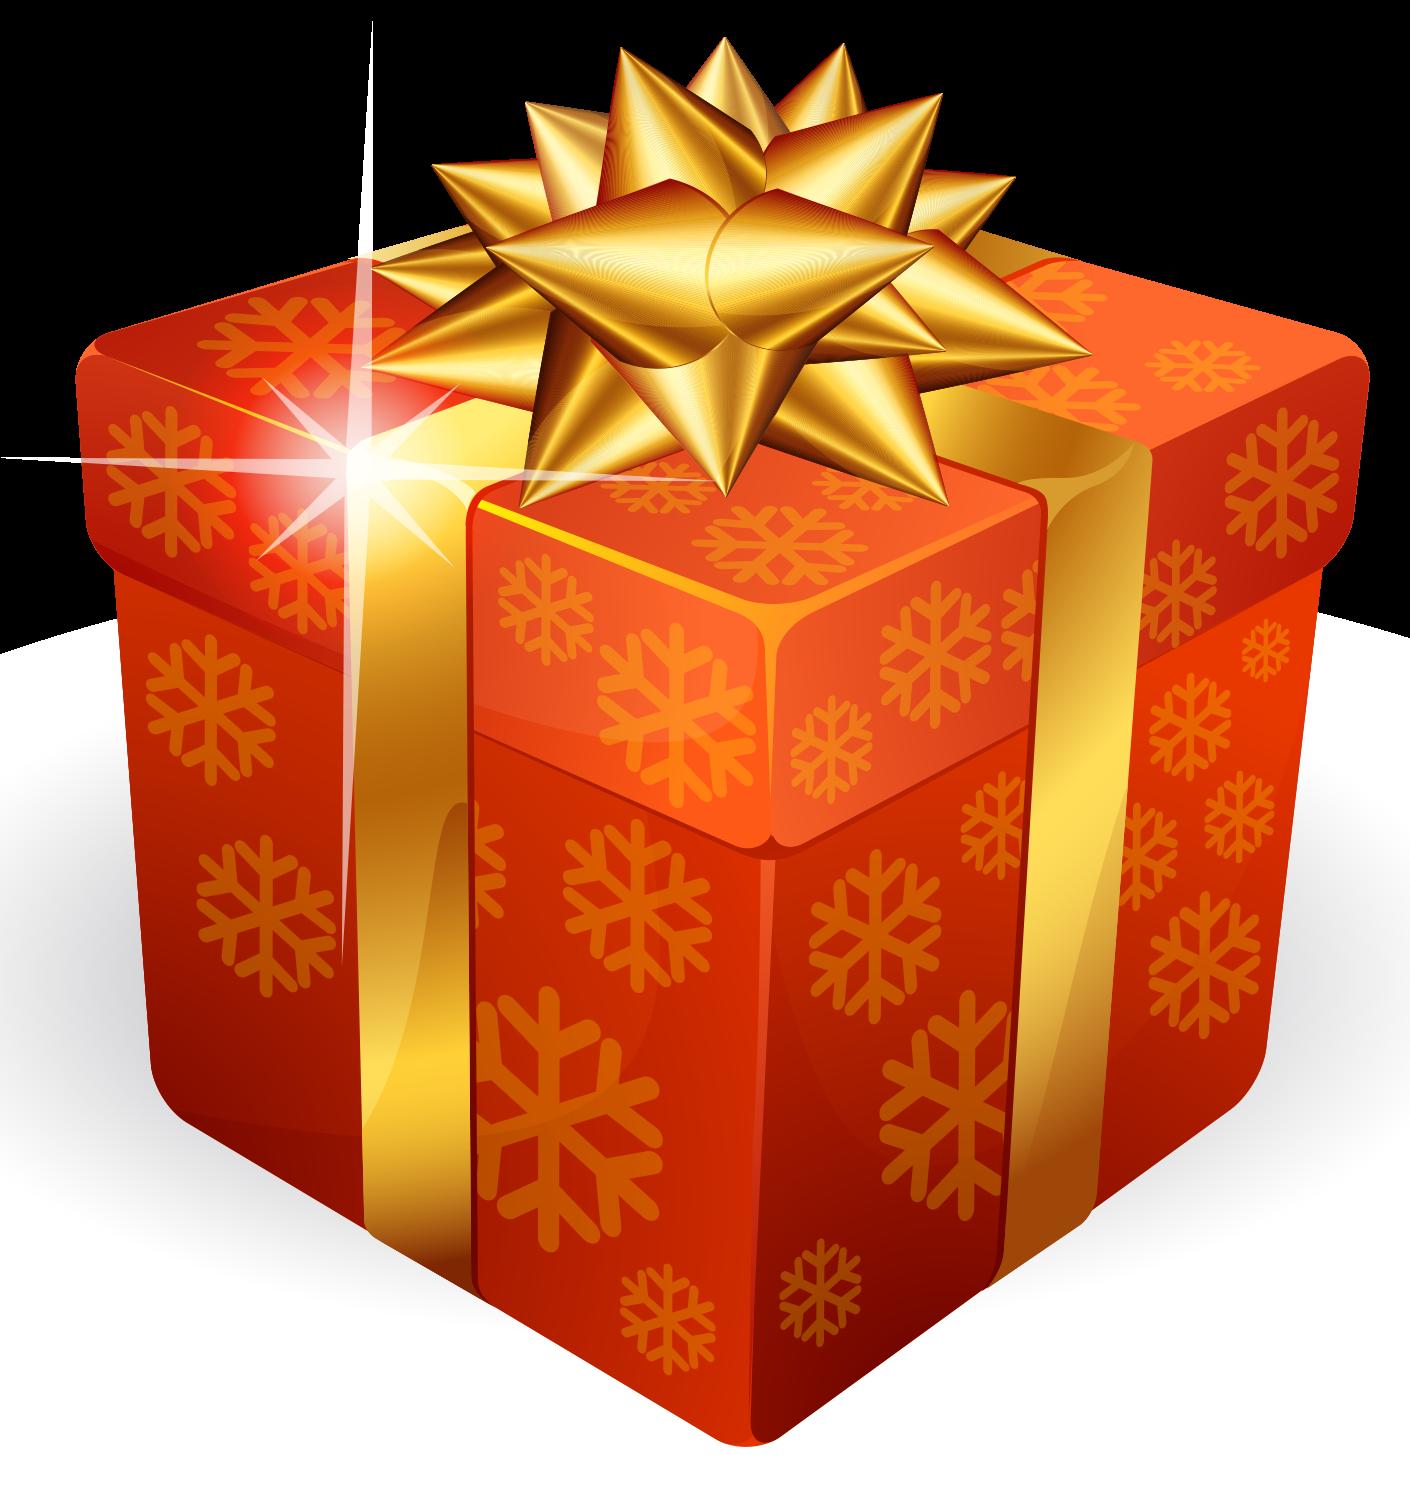 Download Gold Gift Box HQ PNG Image | FreePNGImg